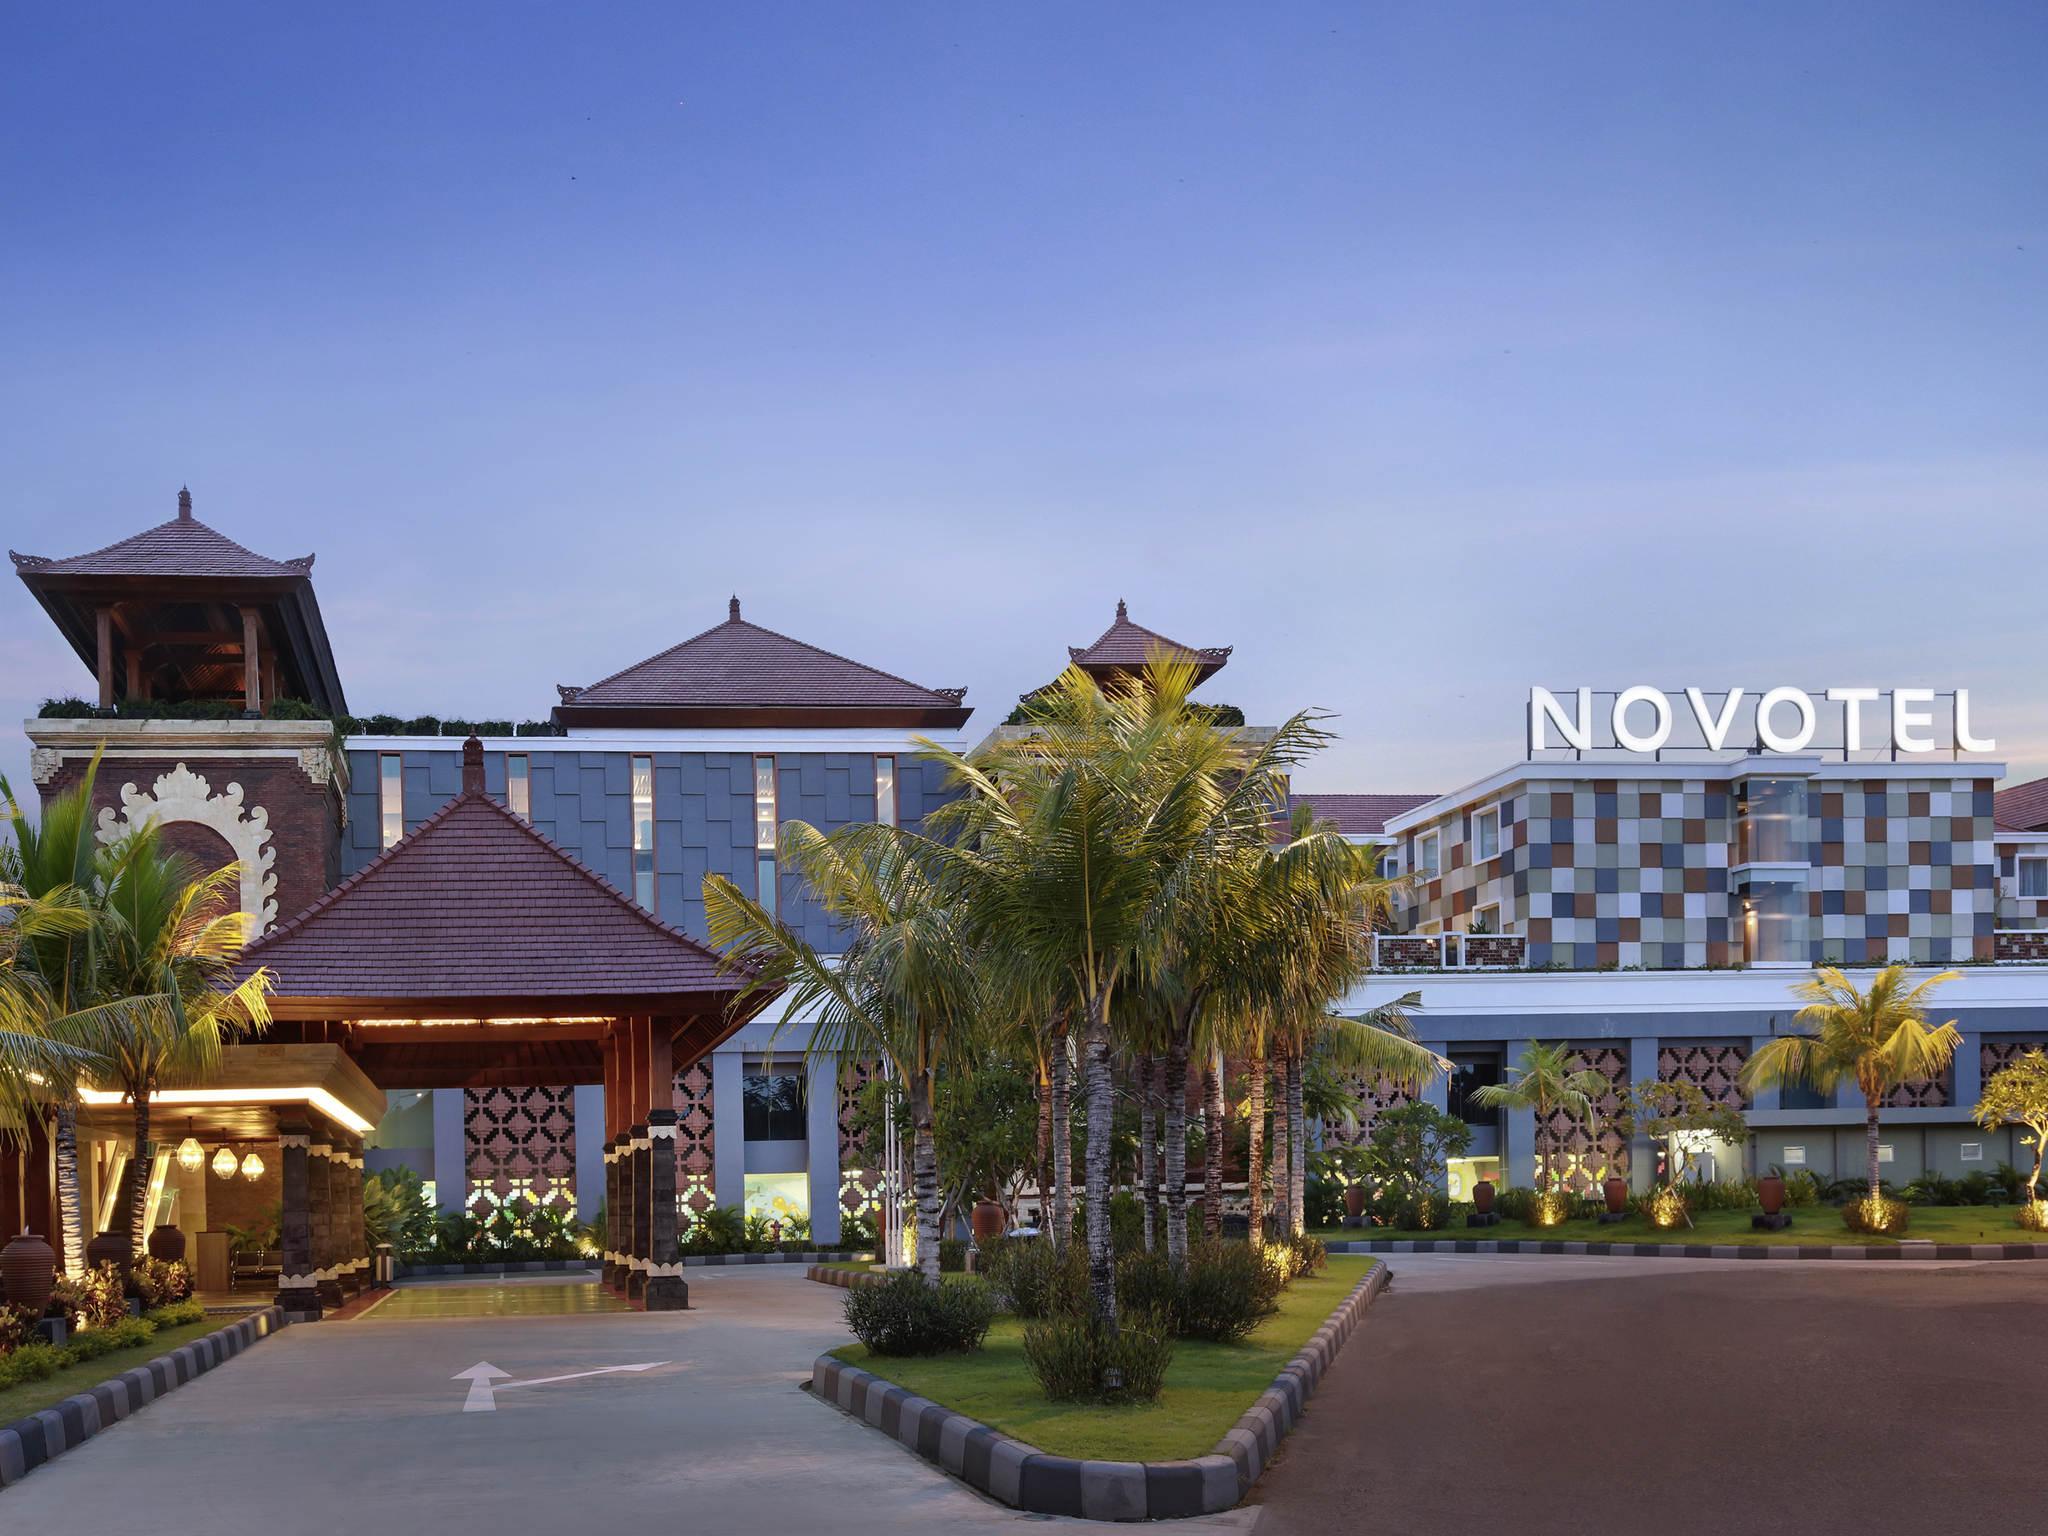 Hotel - Novotel Bali Ngurah Rai Airport